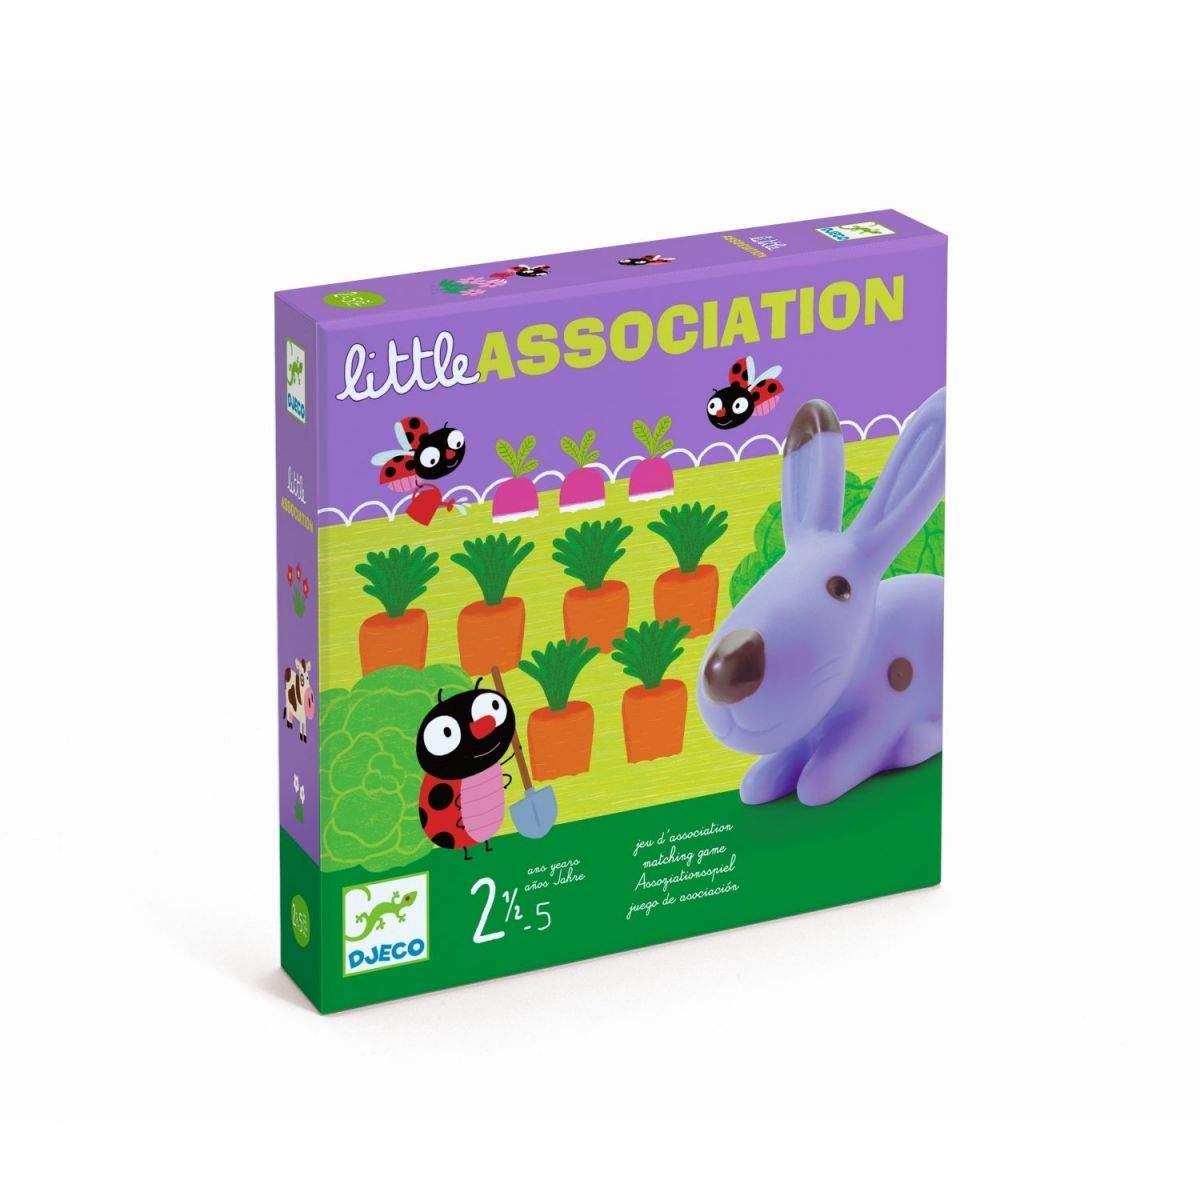 DJ Erste Spiele Little Association 1 600x600 2x